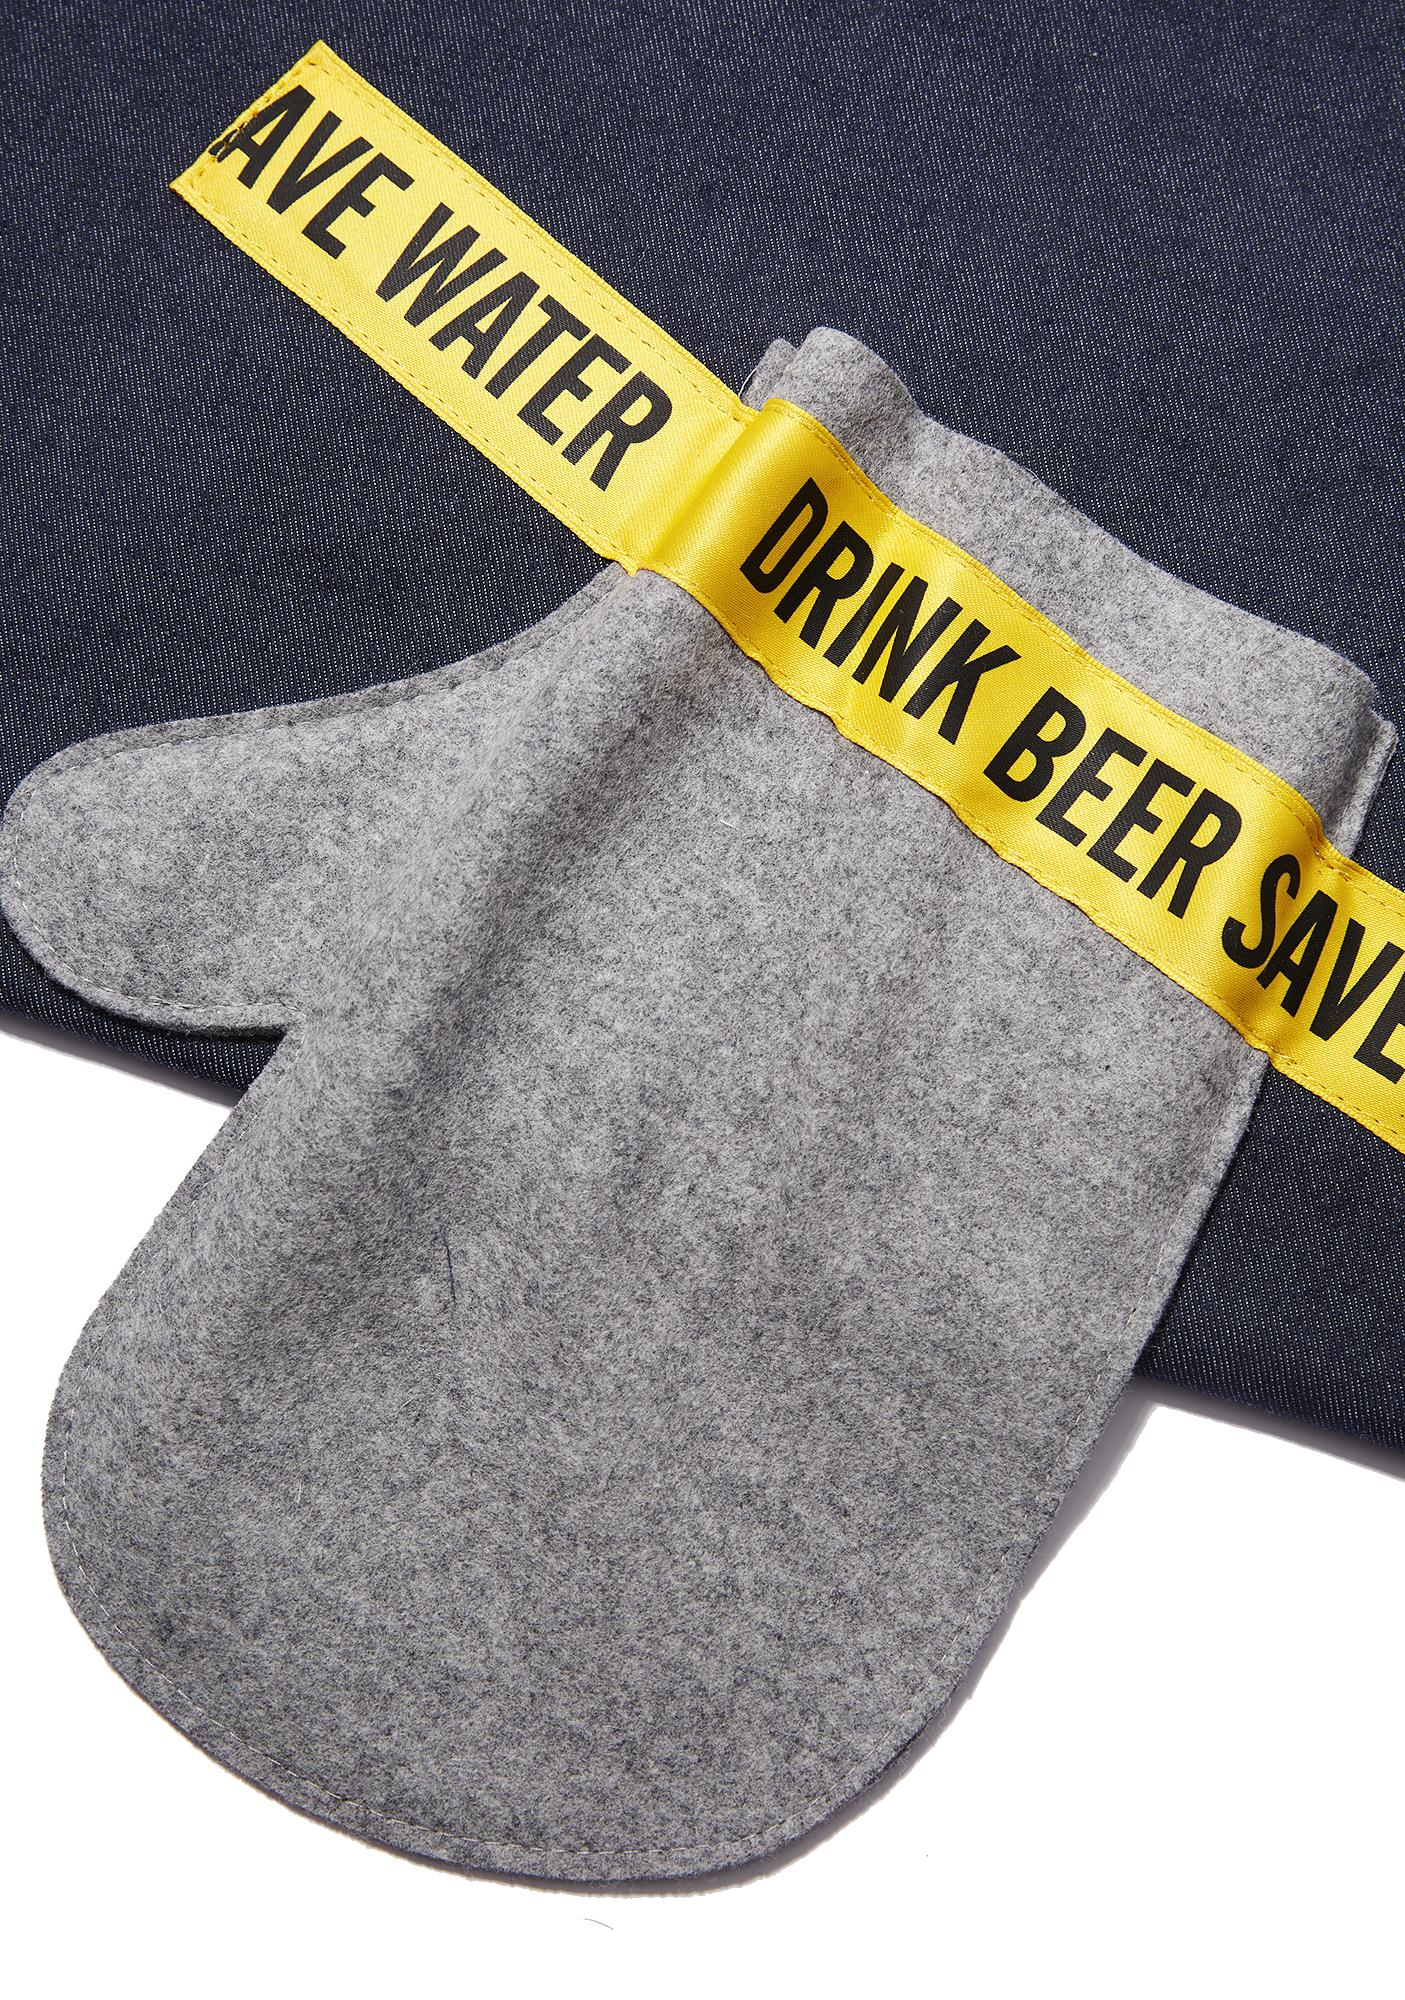 Drink Beer Save Water Mitten Clutch